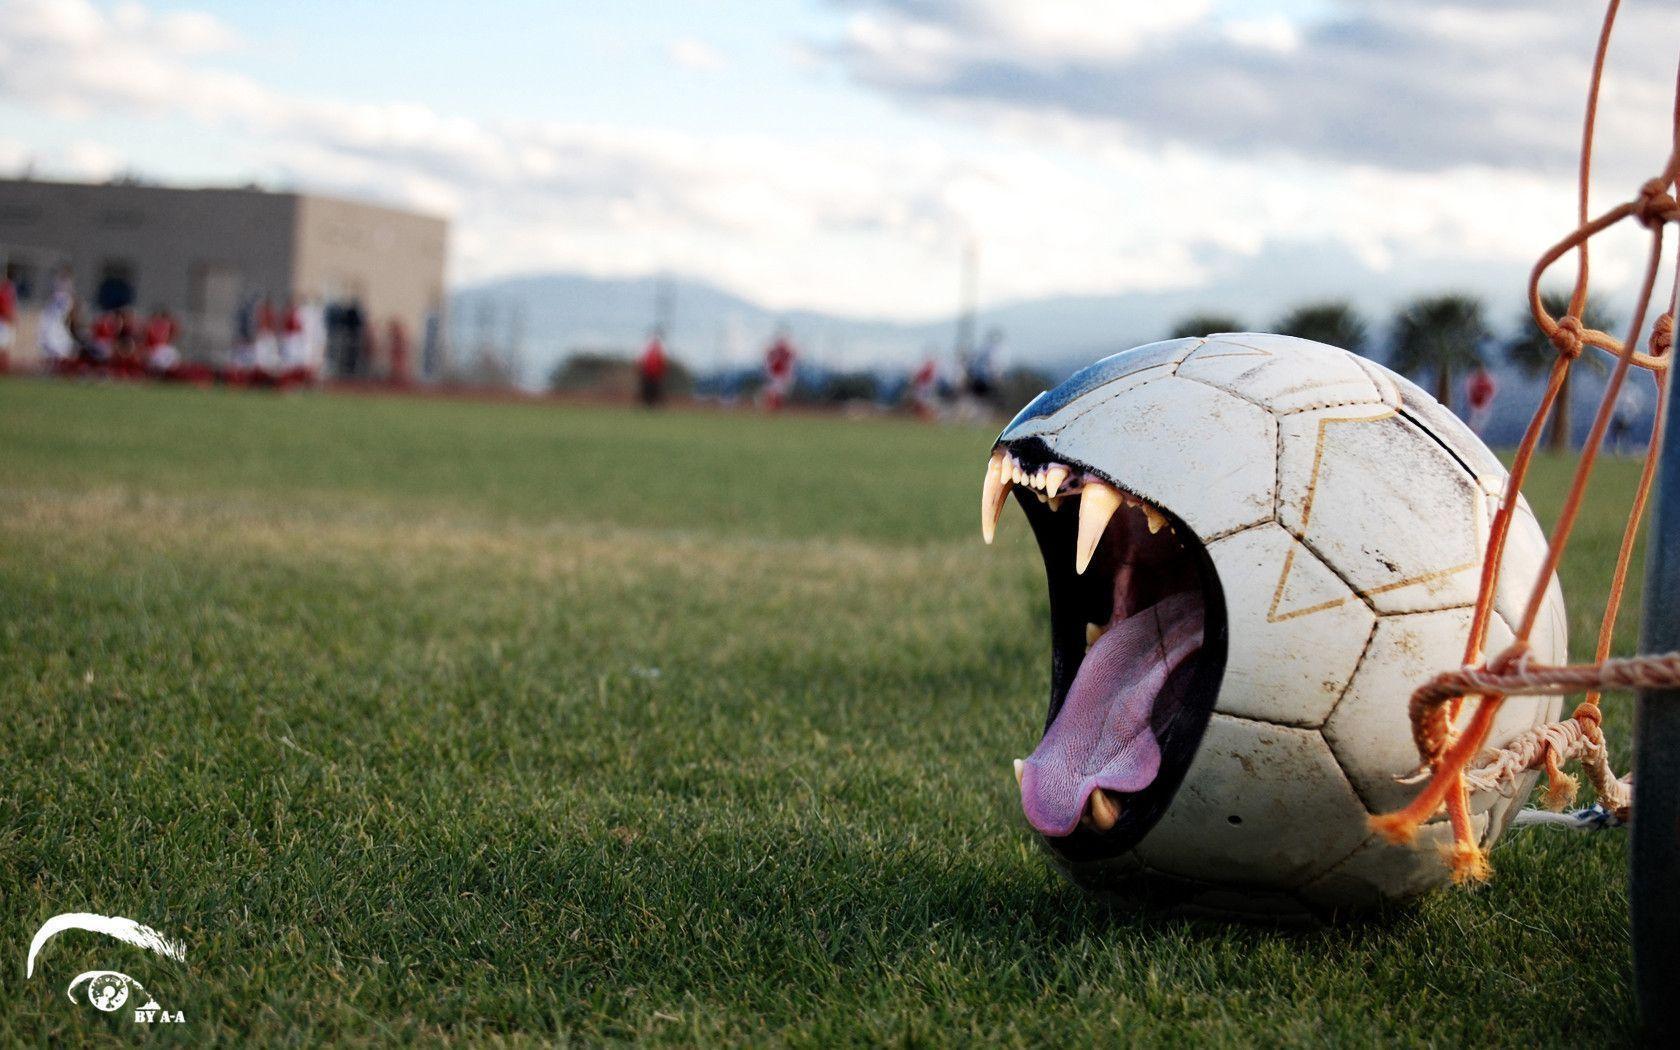 Soccer Wallpaper For Desktop: Awesome Soccer Backgrounds